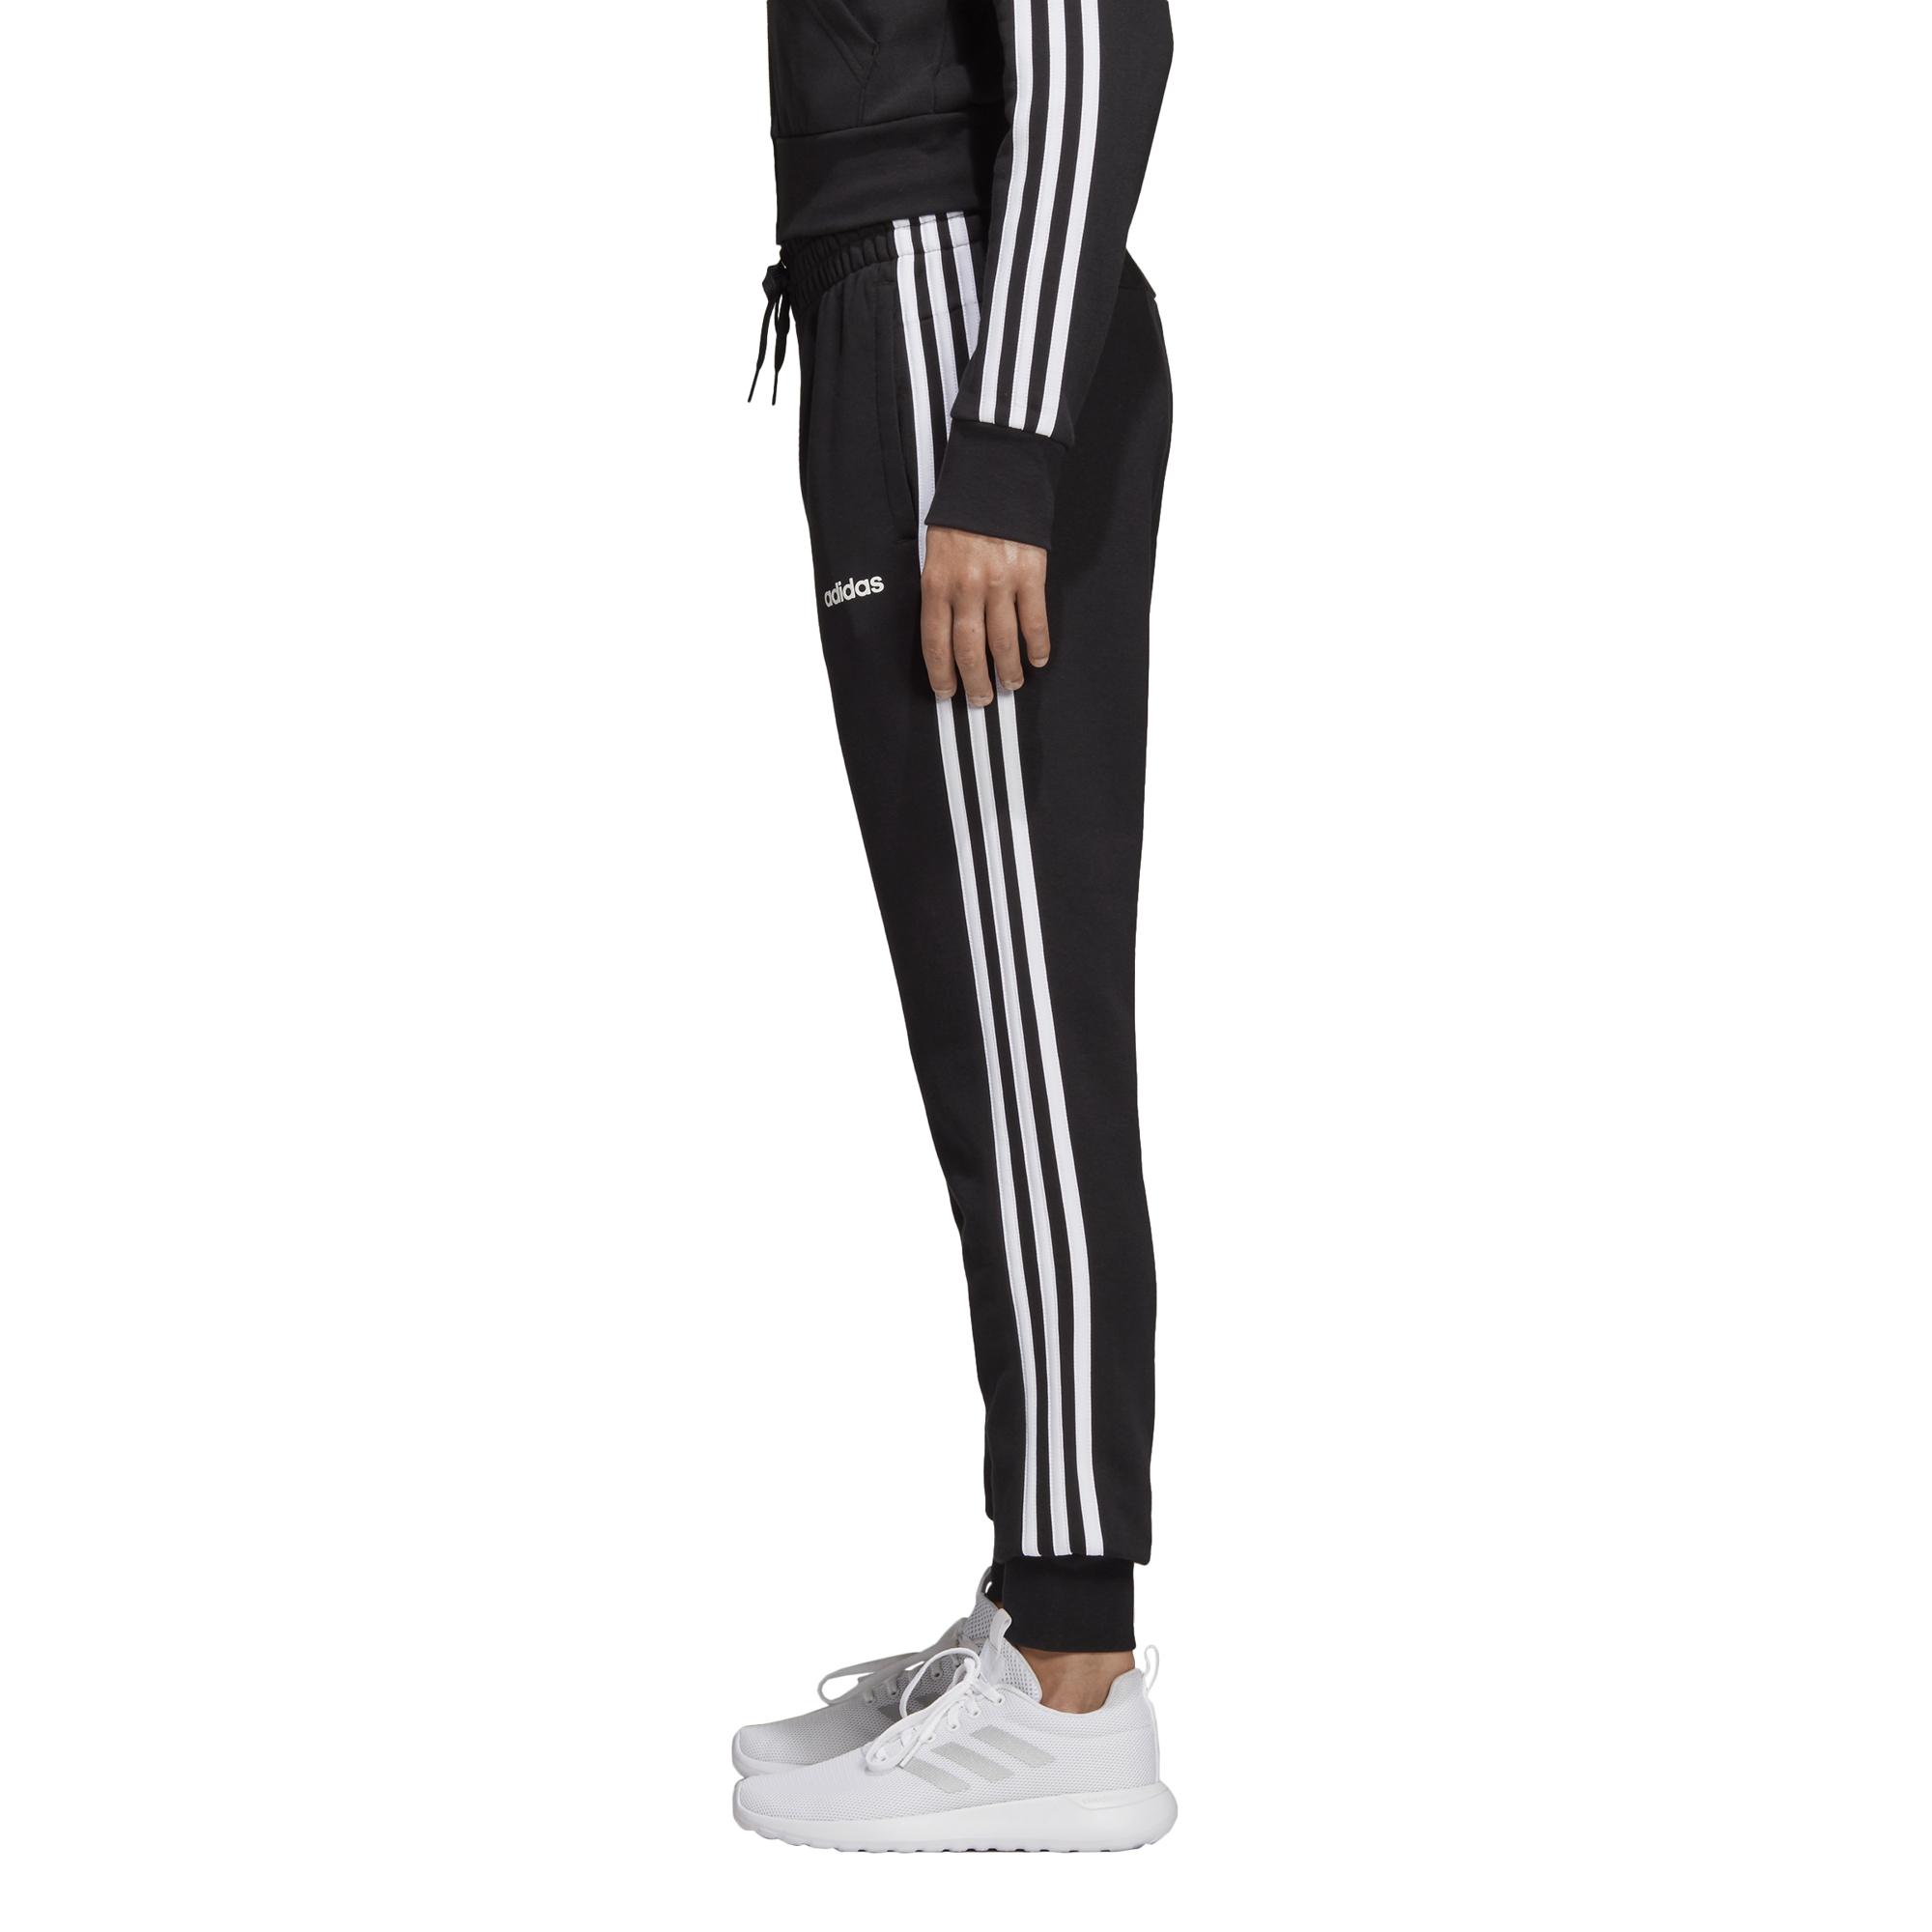 spodnie adidas męskie 3 stripes